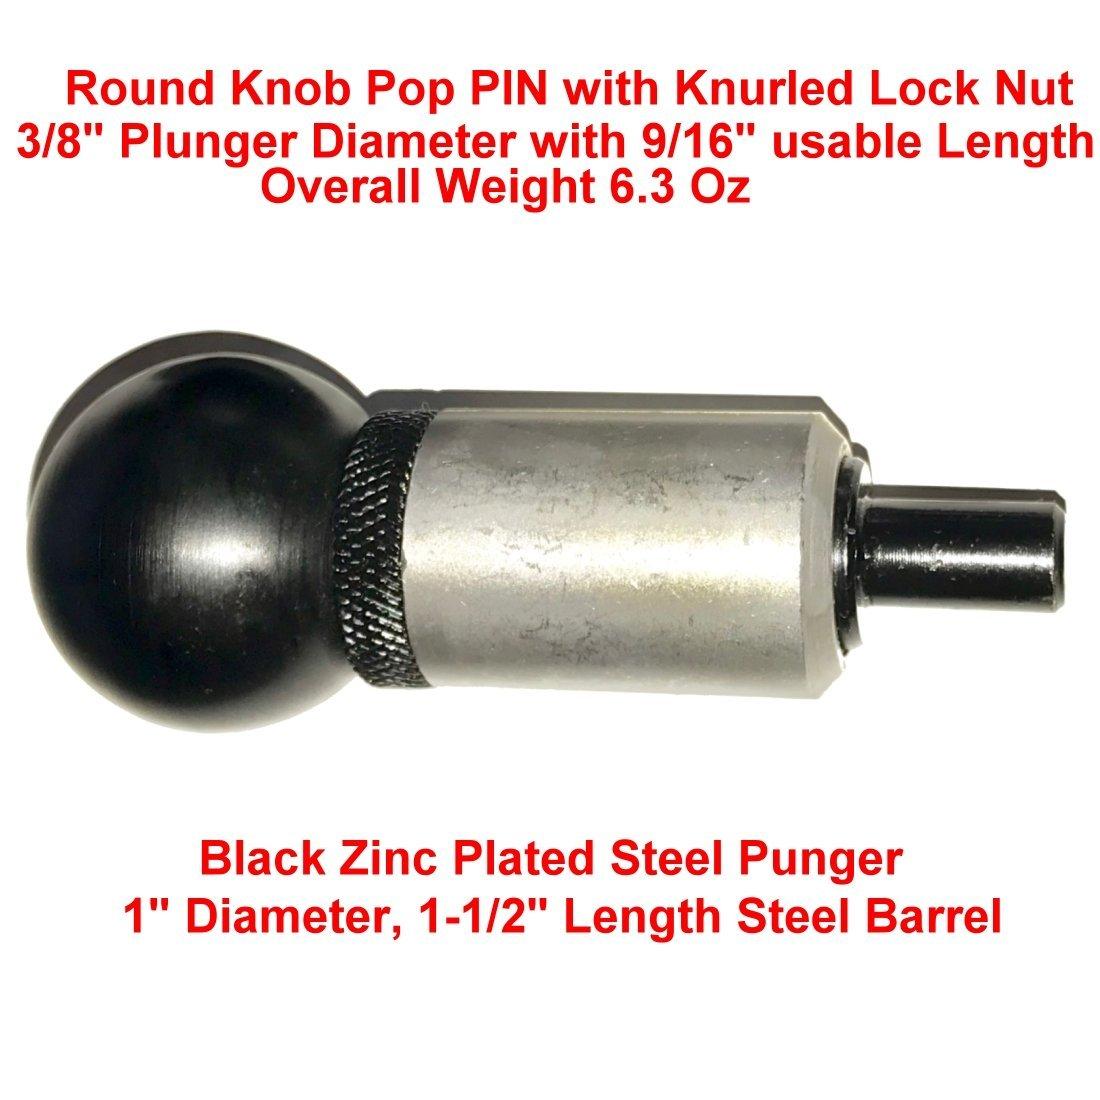 Knurled Lock Nut. Pack of 4 Plastic ROUND Knob 1//2 Diameter Spring Loaded Zinc Plated Steel Plunger SBDs Premium POP Pull Pins 1 Diameter x 1-1//2 Length Weld ON Steel Barrel